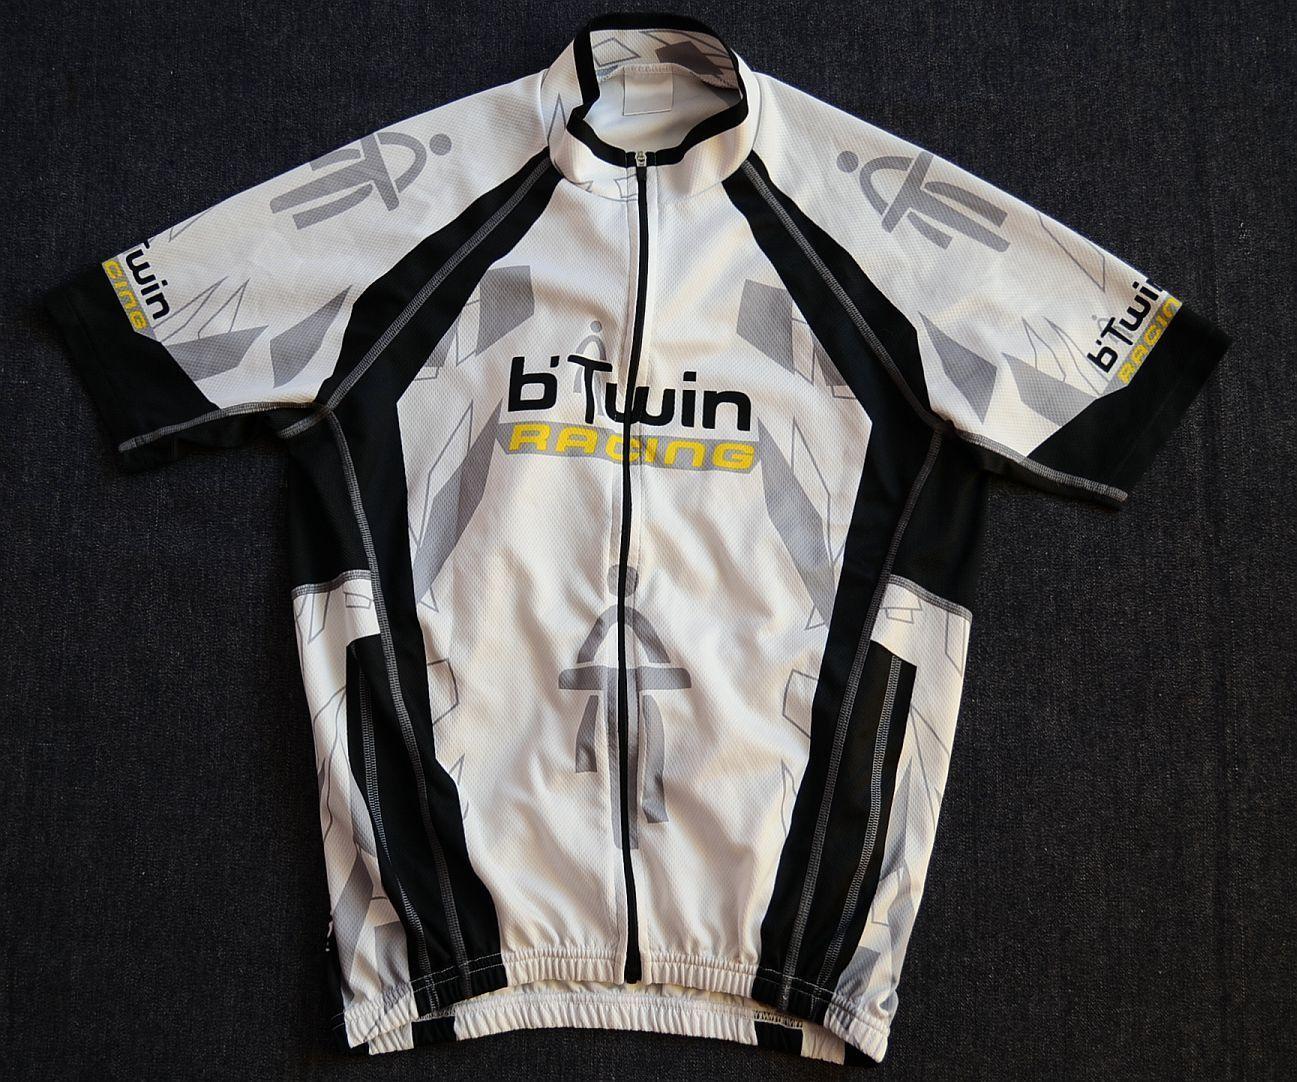 b Twin Decathlon jersey 4592d9c20